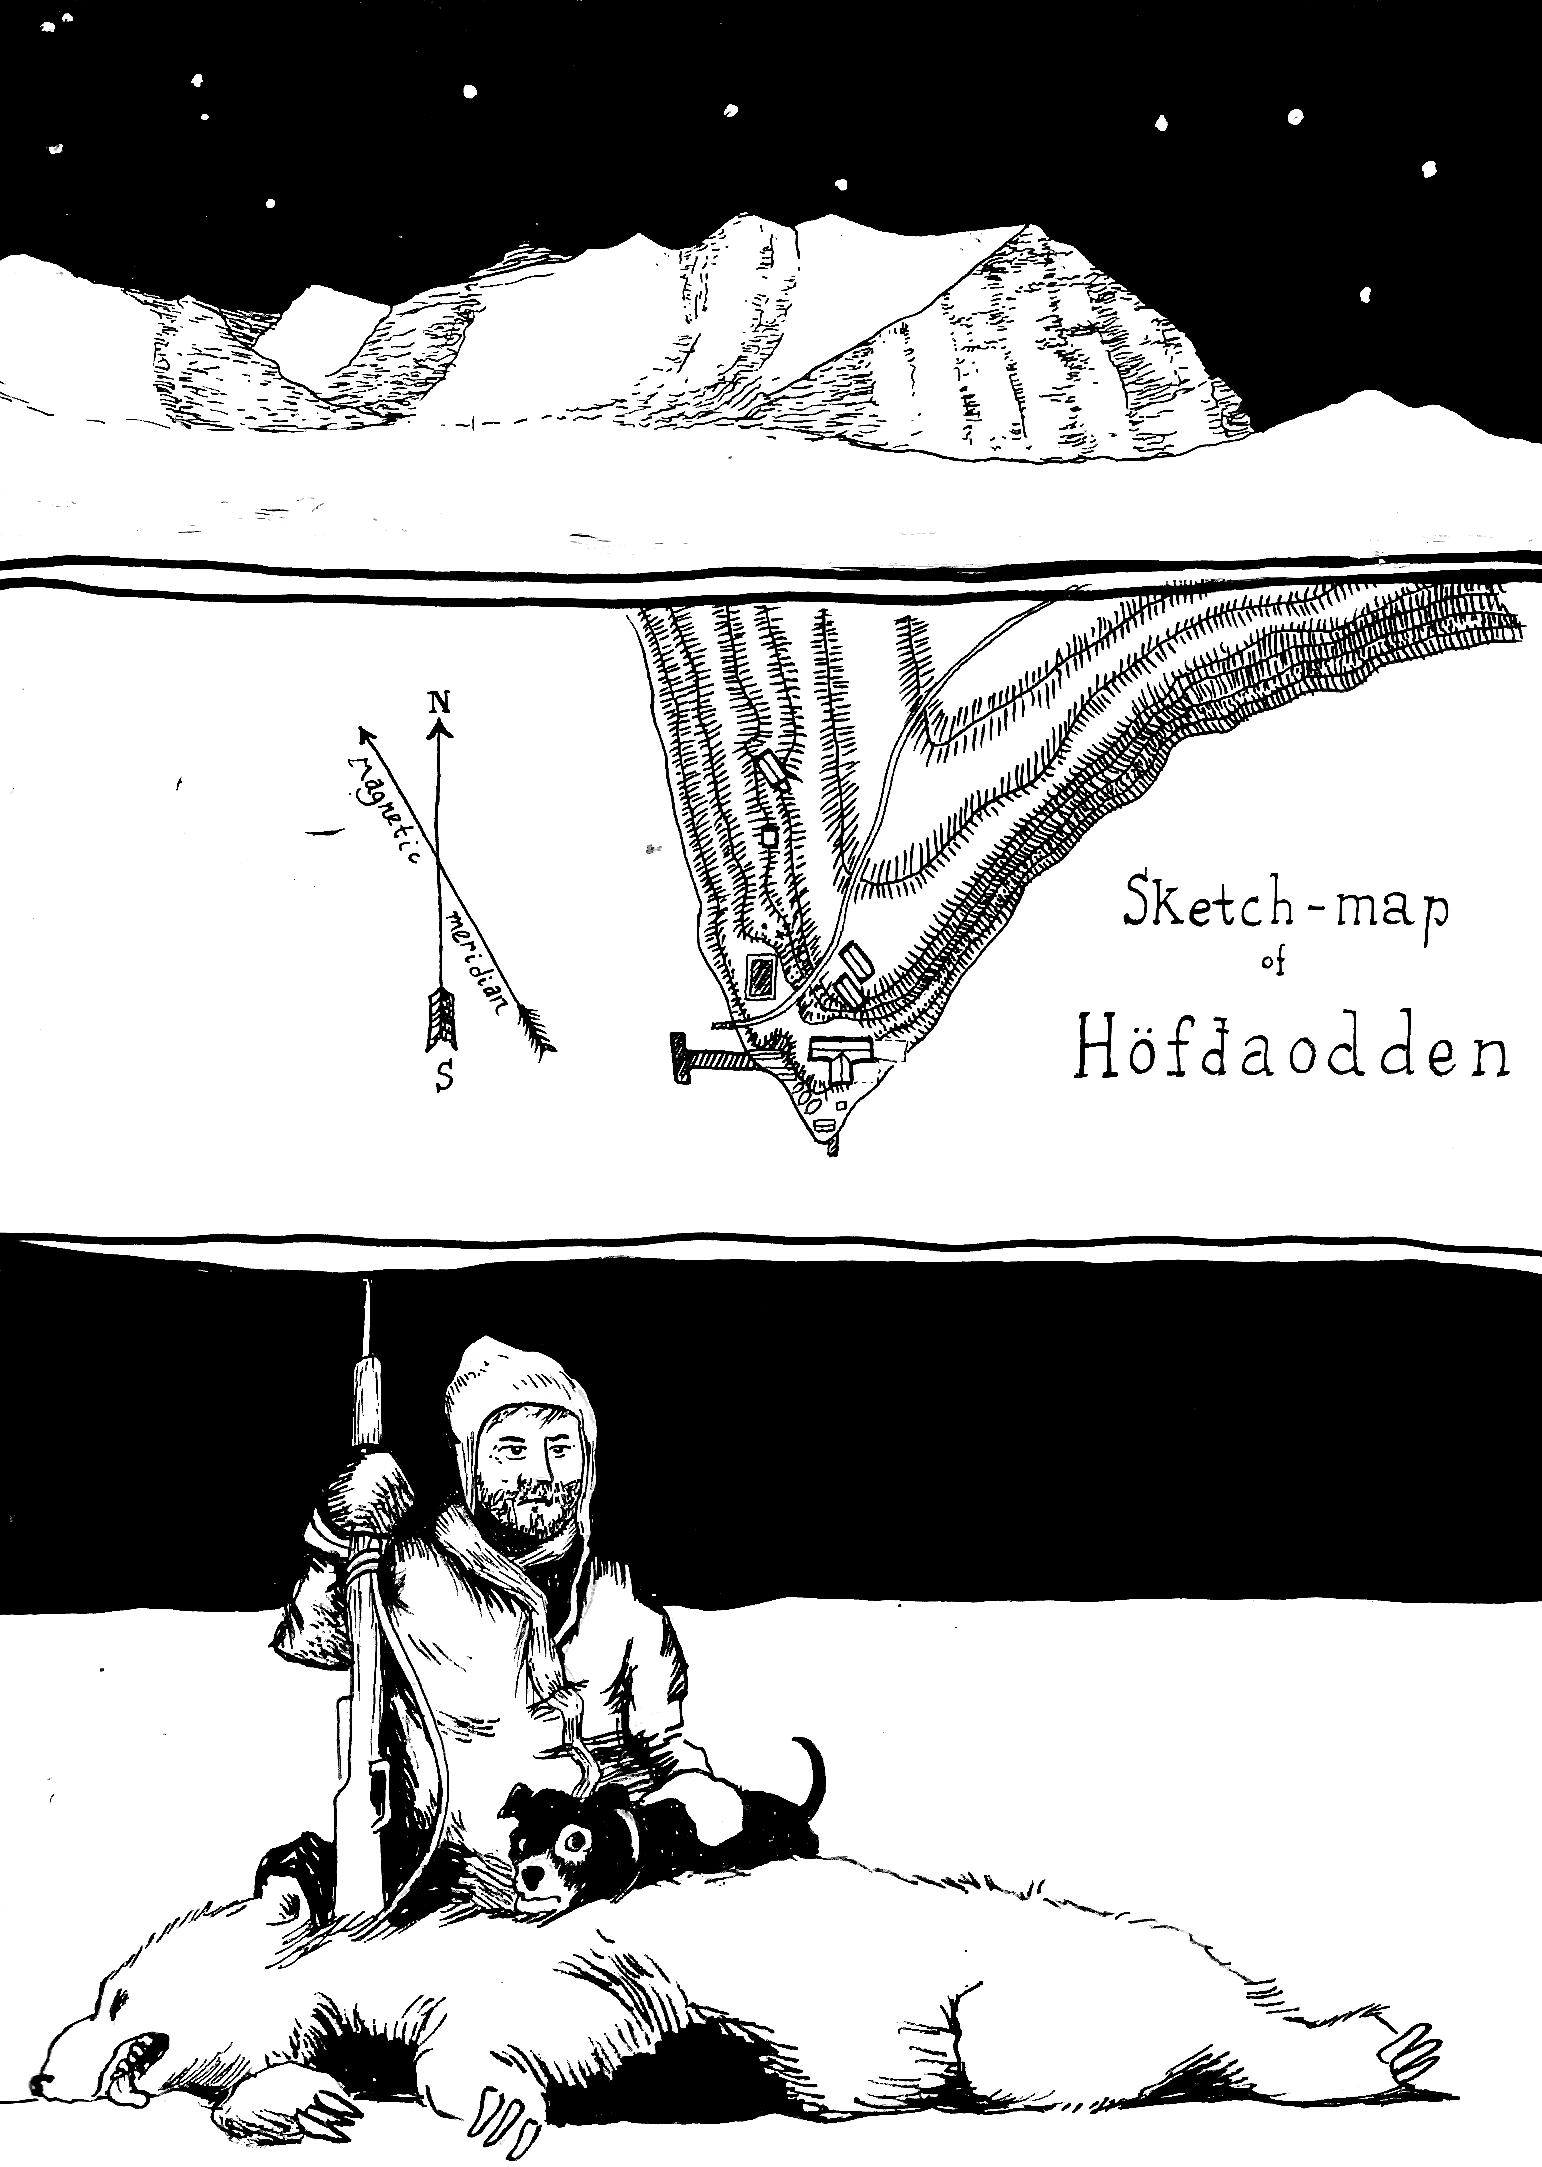 arctic sketches 2.jpg